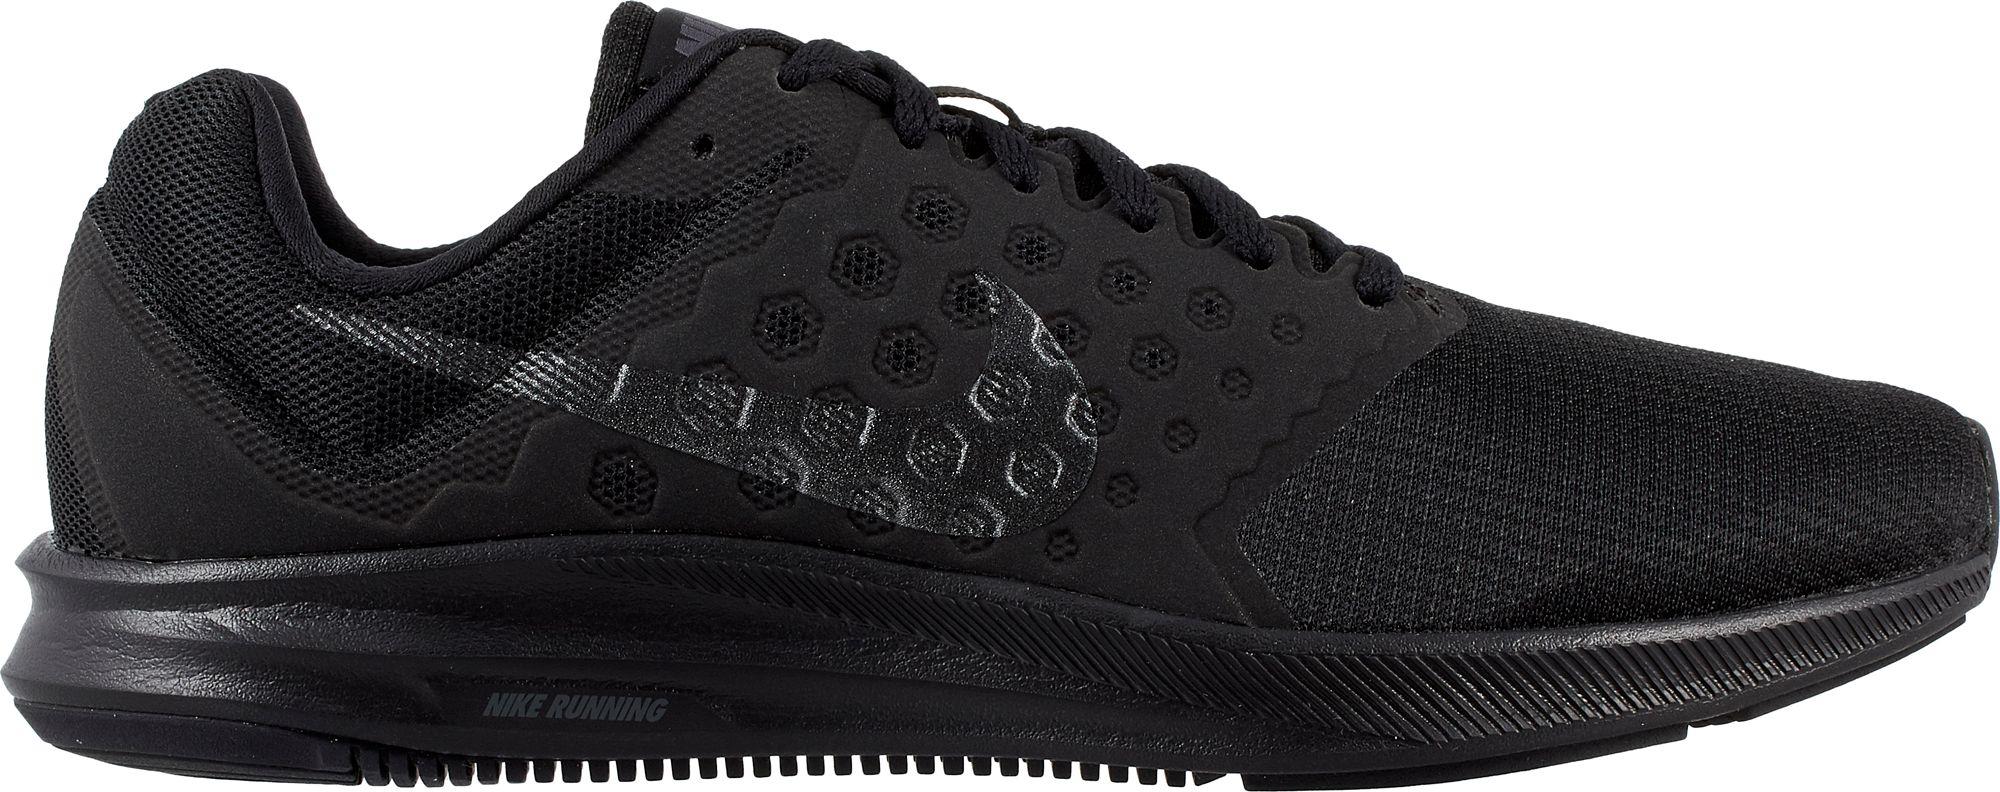 0aa8637b1cae Nike Downshifter 7 Men s Running Shoes  44.99 - Slickdeals.net